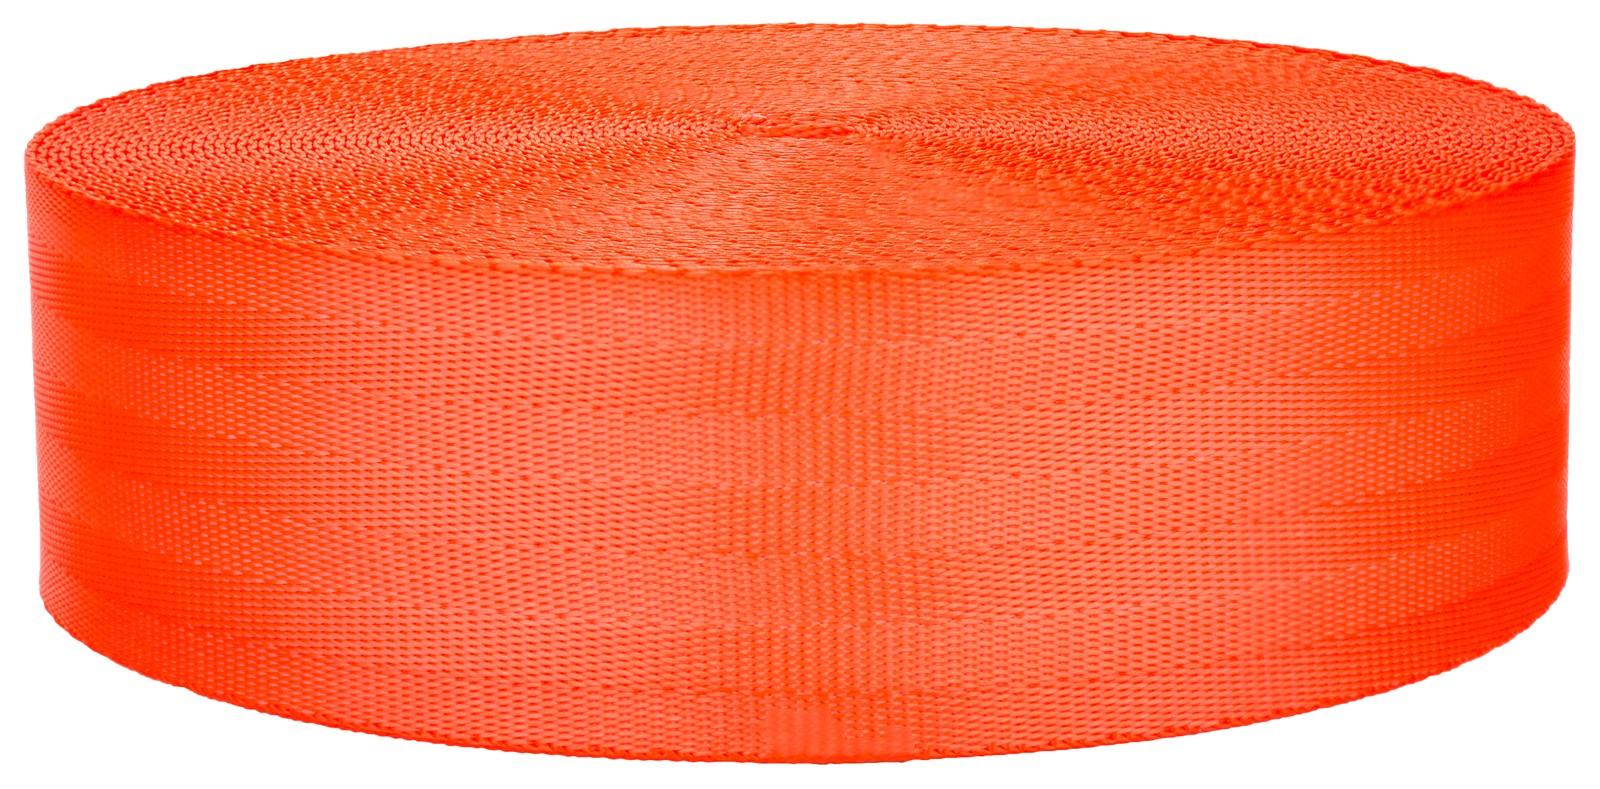 Buy 2 Inch Seat Belt Hot Orange Polyester Webbing Closeout